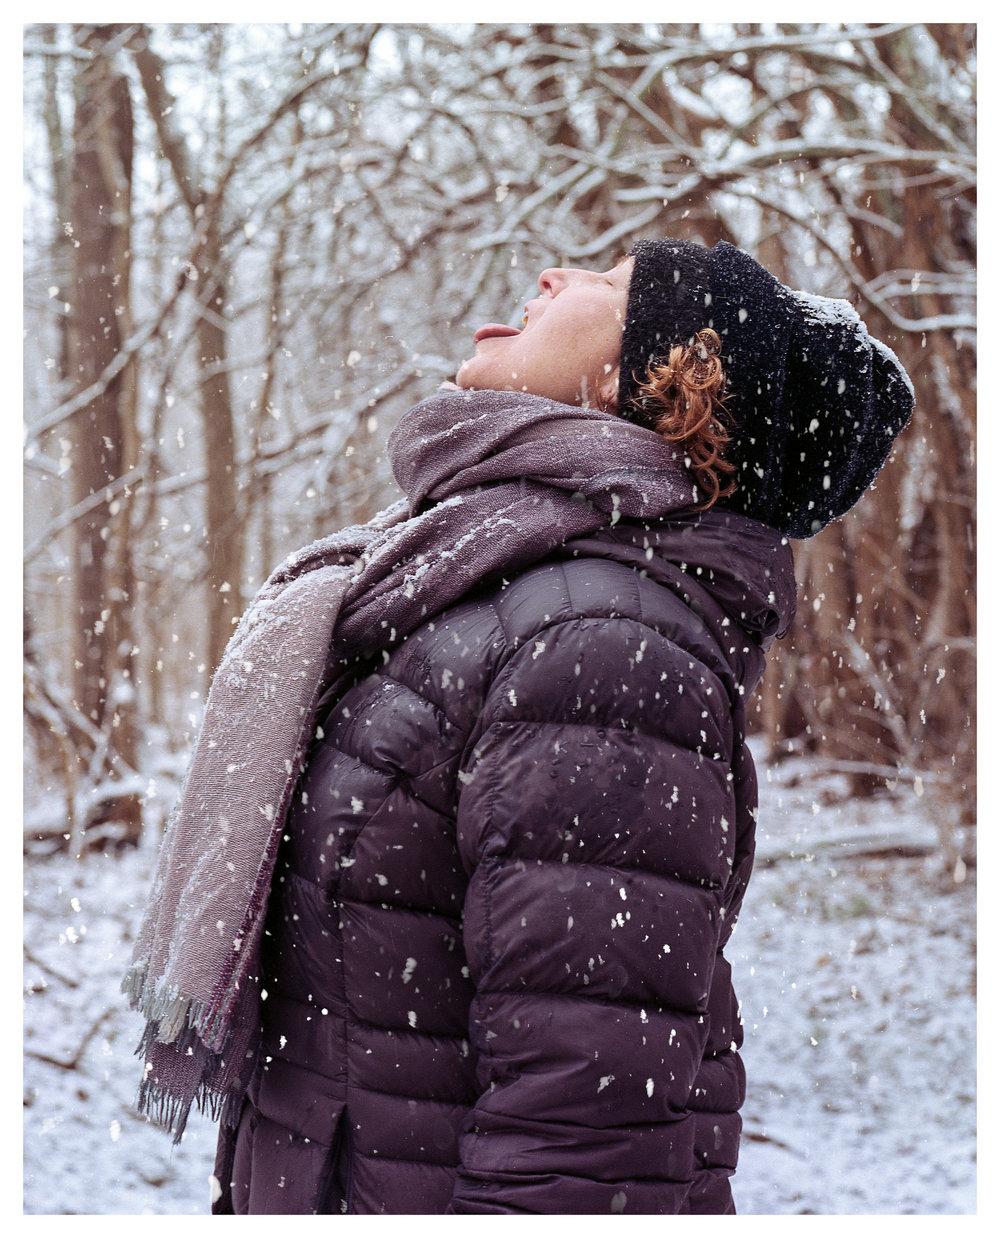 Renee on Christmas 2018 Hike - Kodak Portra 400 rated at 200, Mamiya 645 ProTL